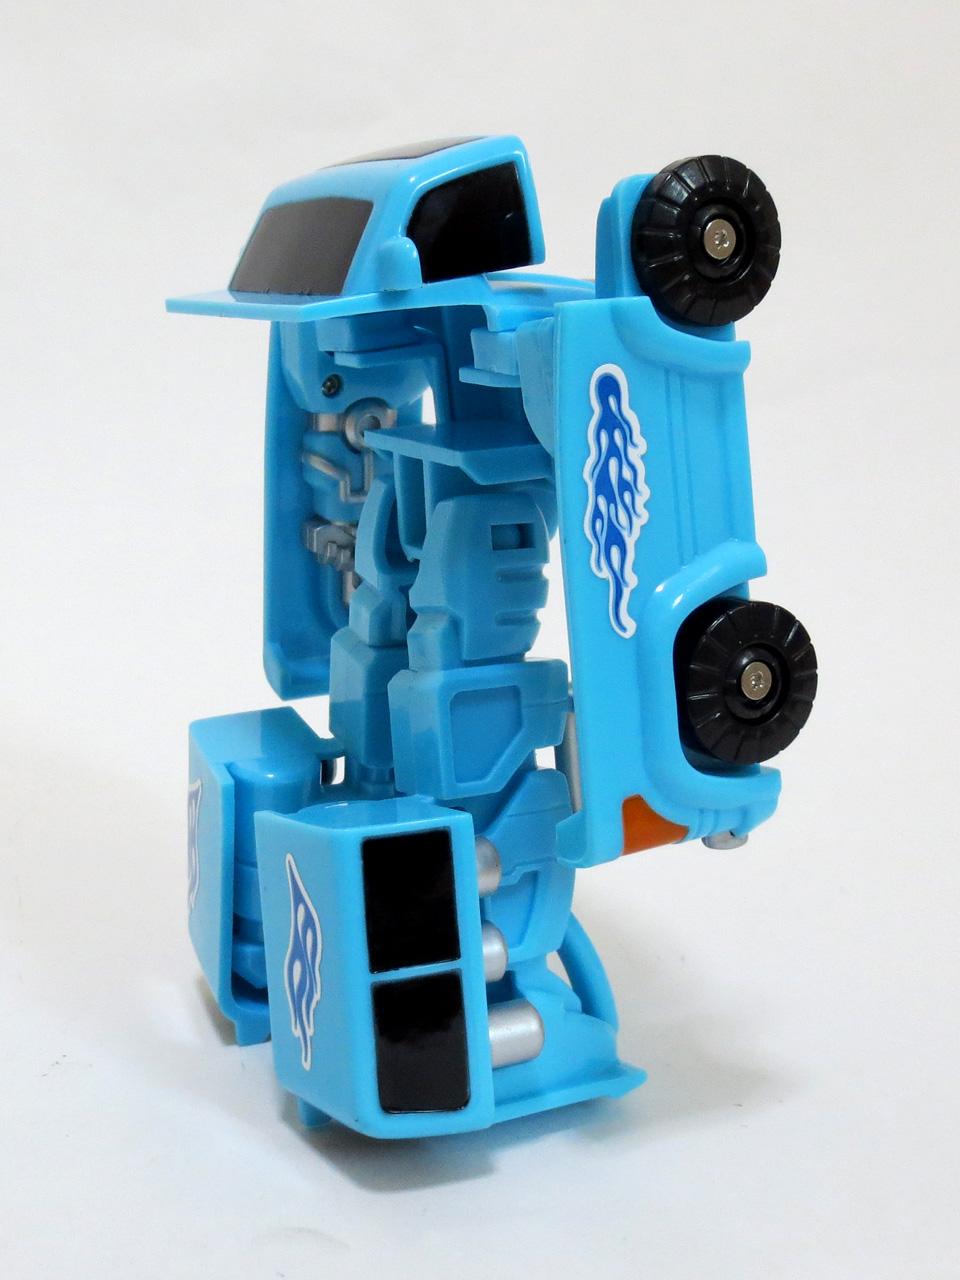 Robo_max_4wd_type_17.jpg